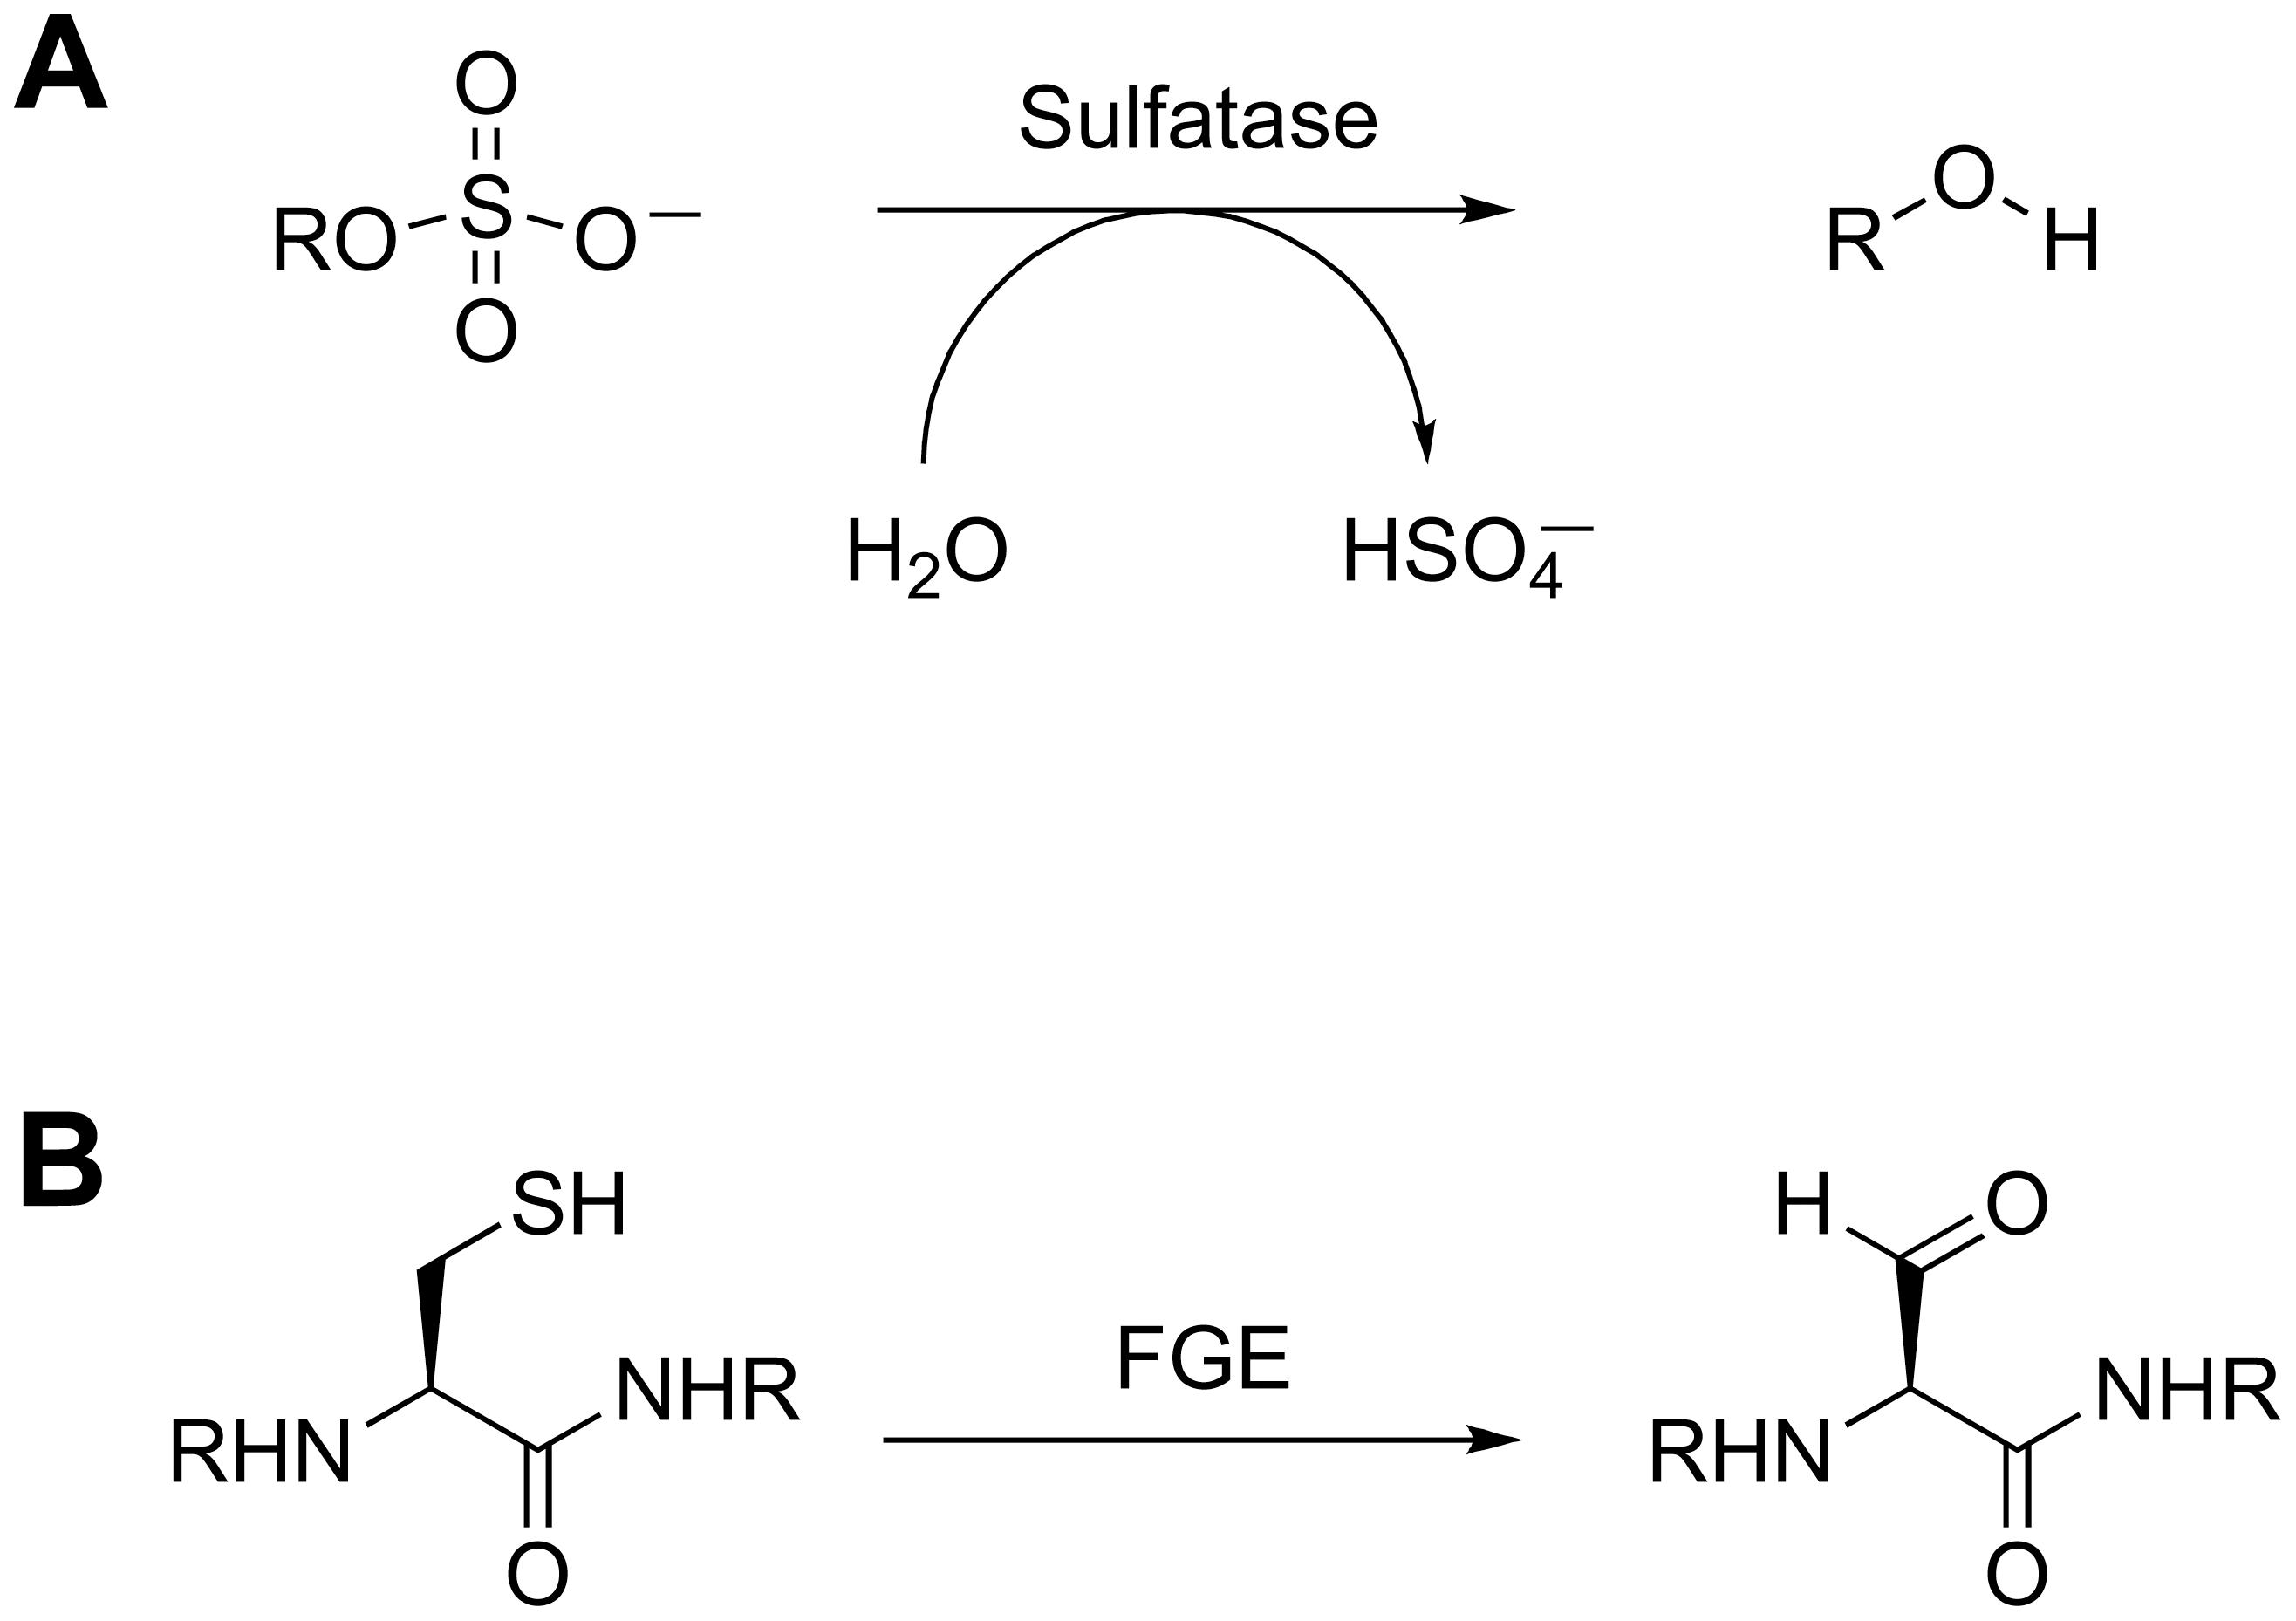 Sulfatase biochemistry.